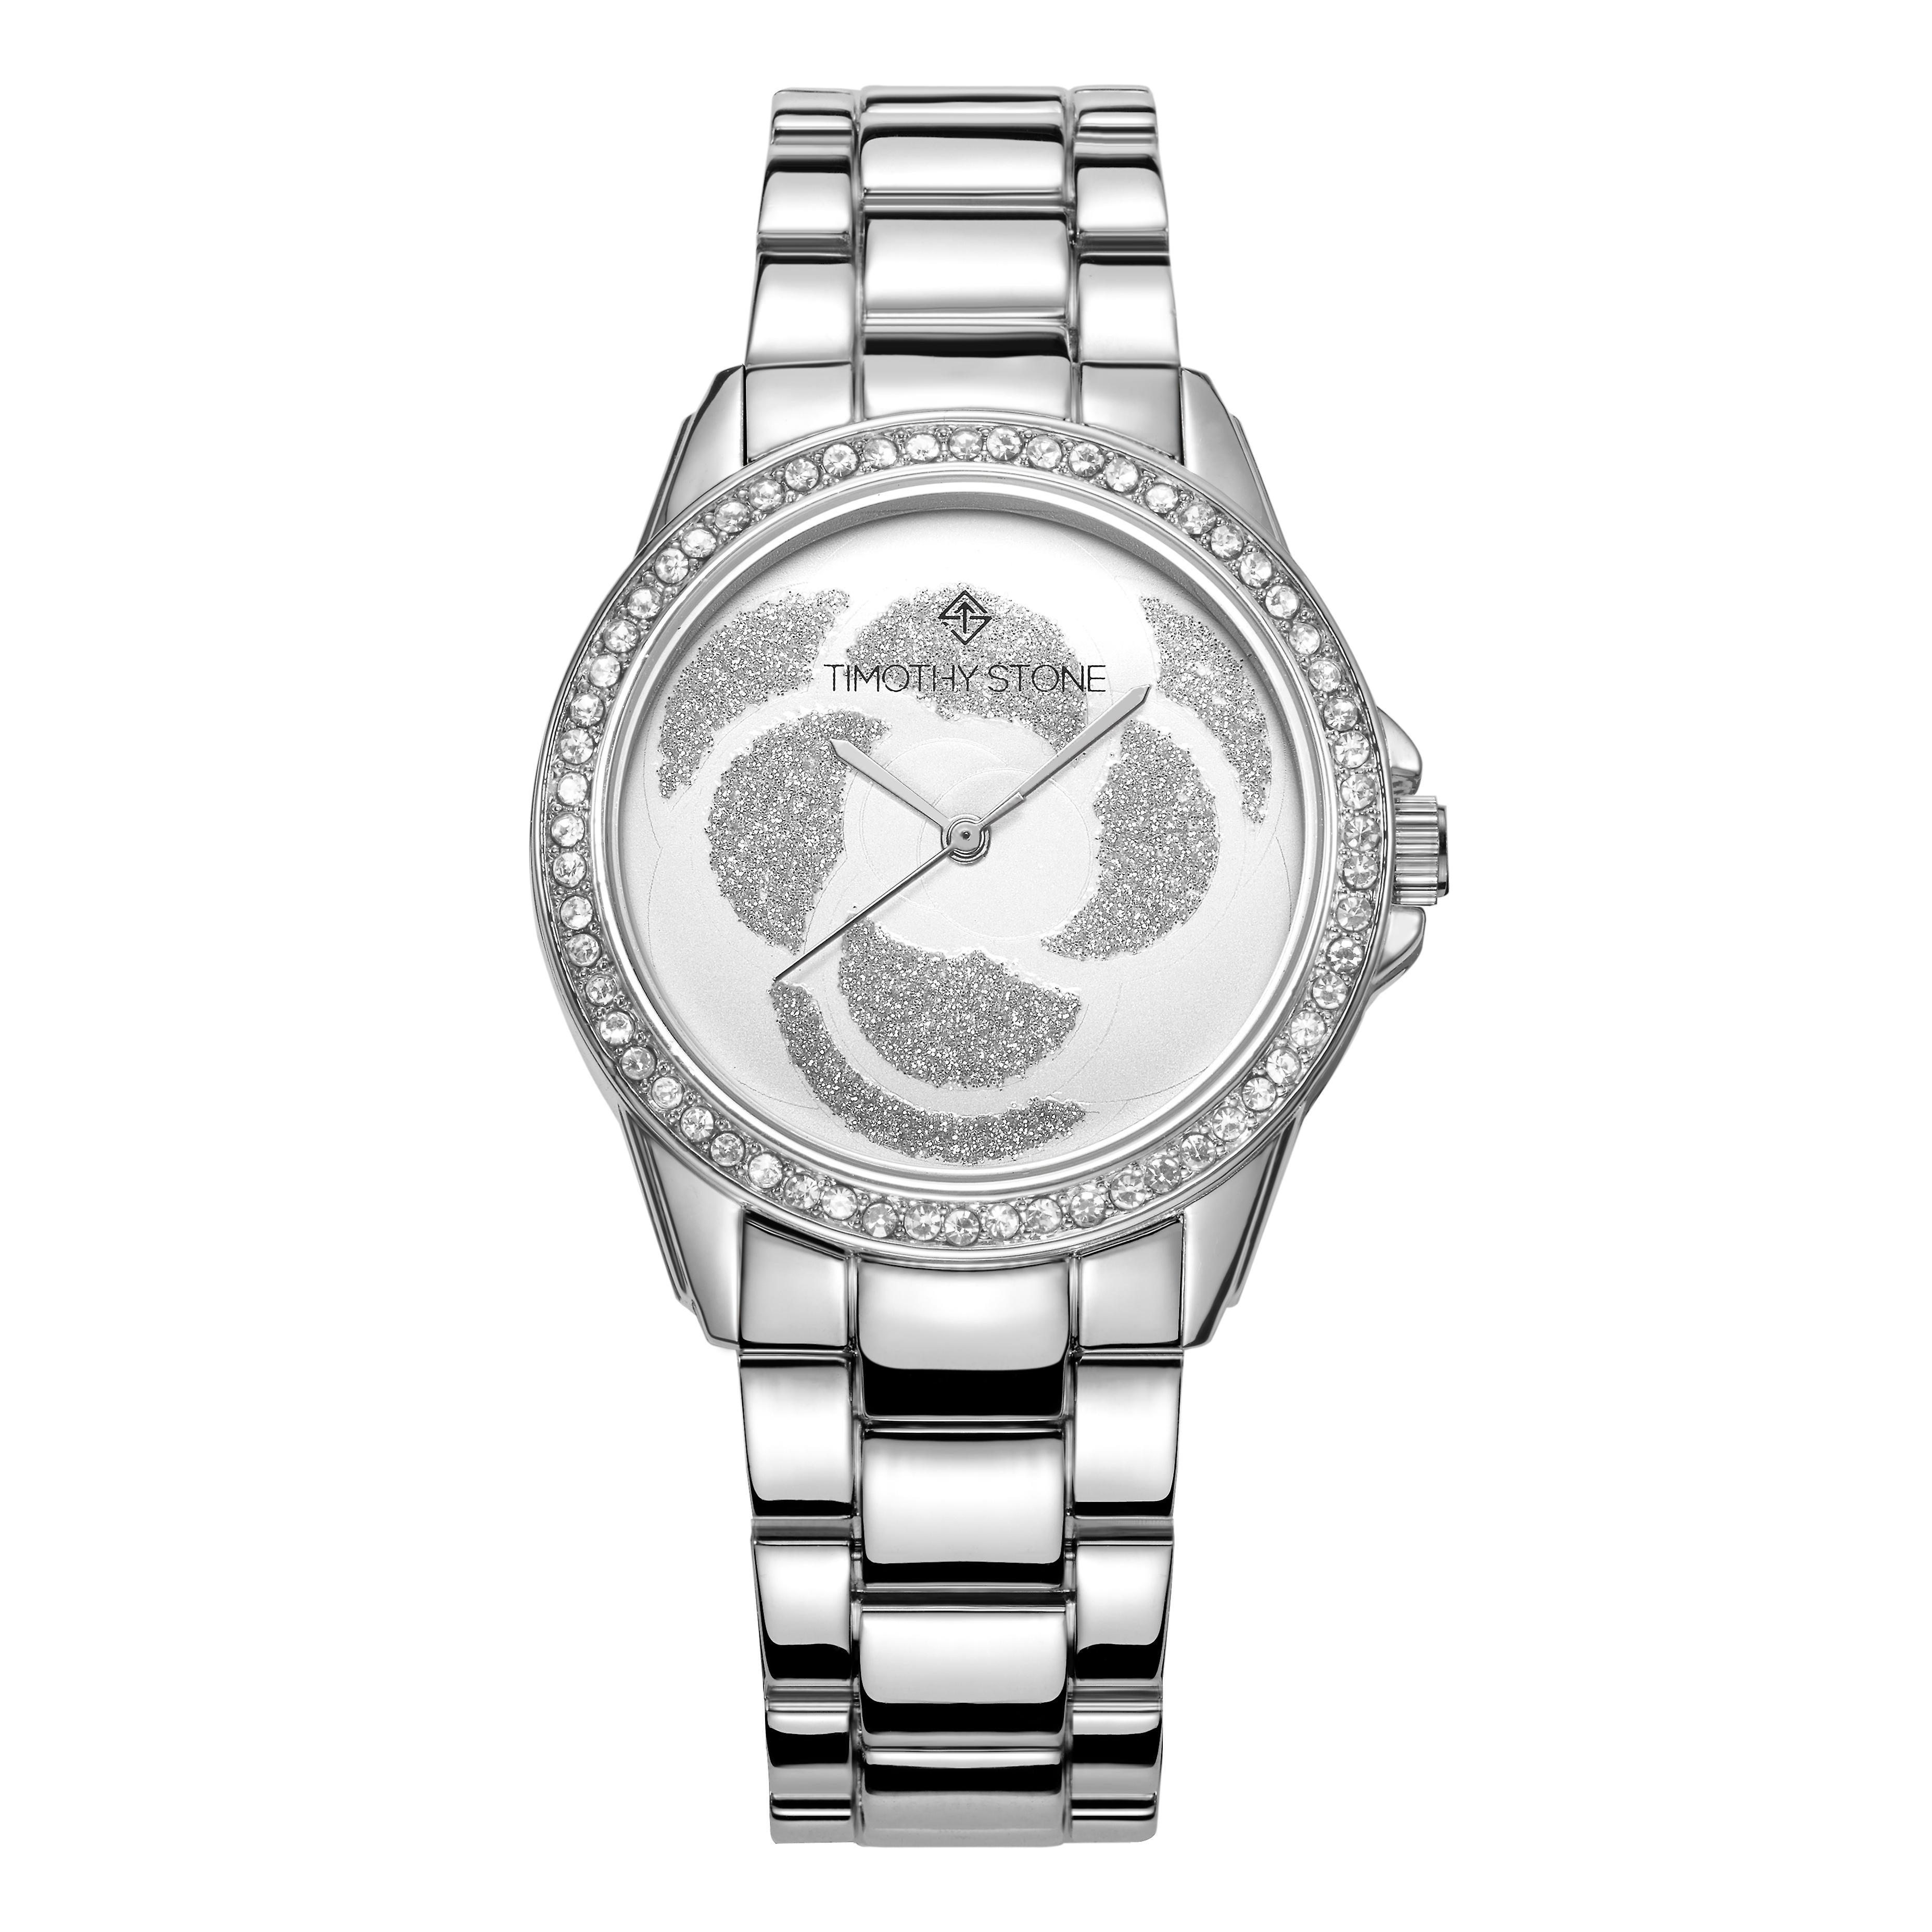 Timothy Stone Women's KATY Silver-Tone Watch